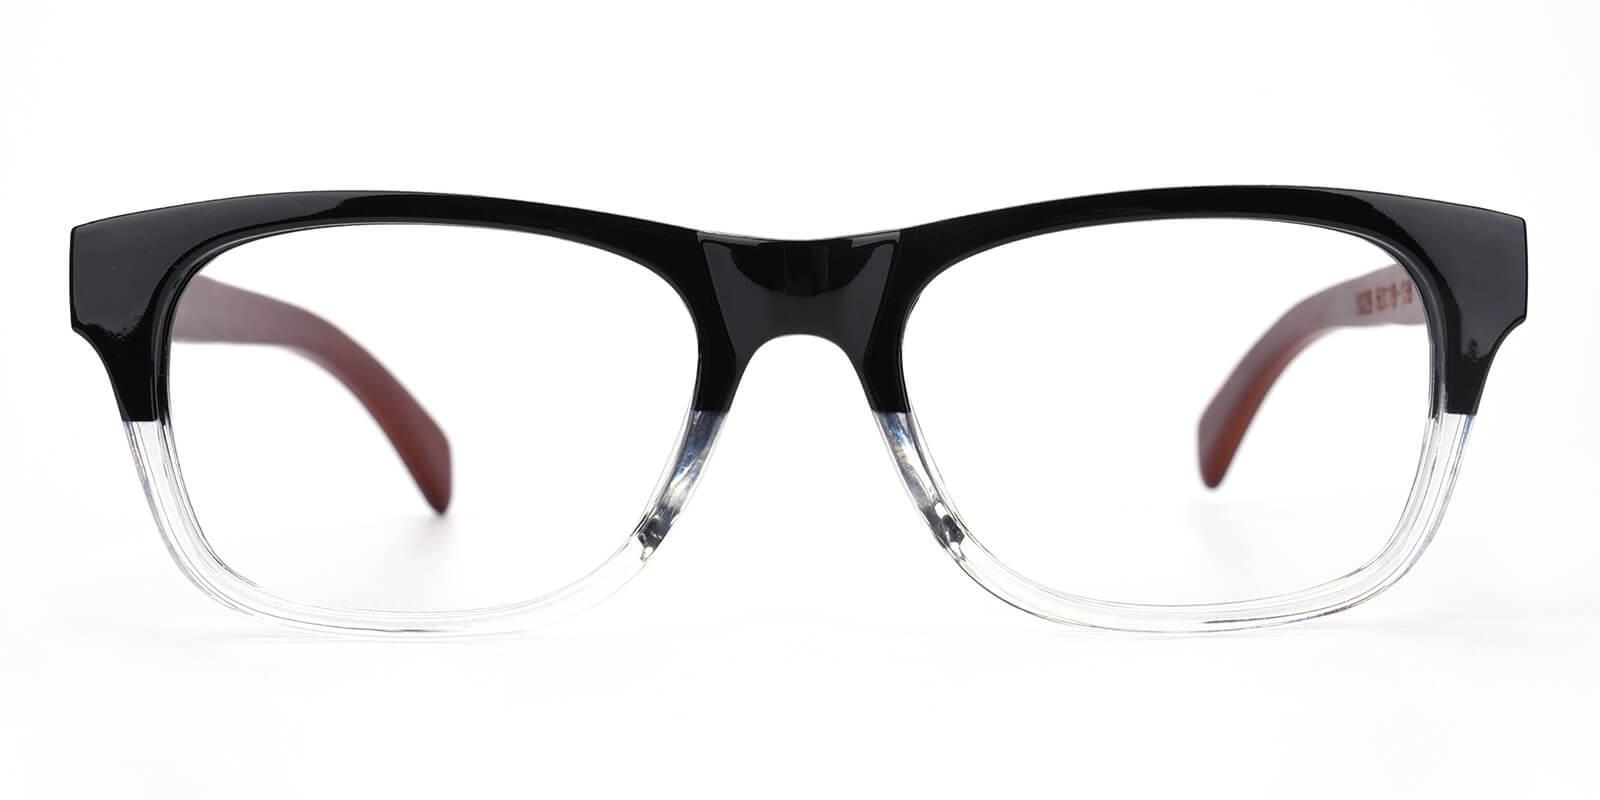 Intense-Multicolor-Square-Acetate-Eyeglasses-additional2